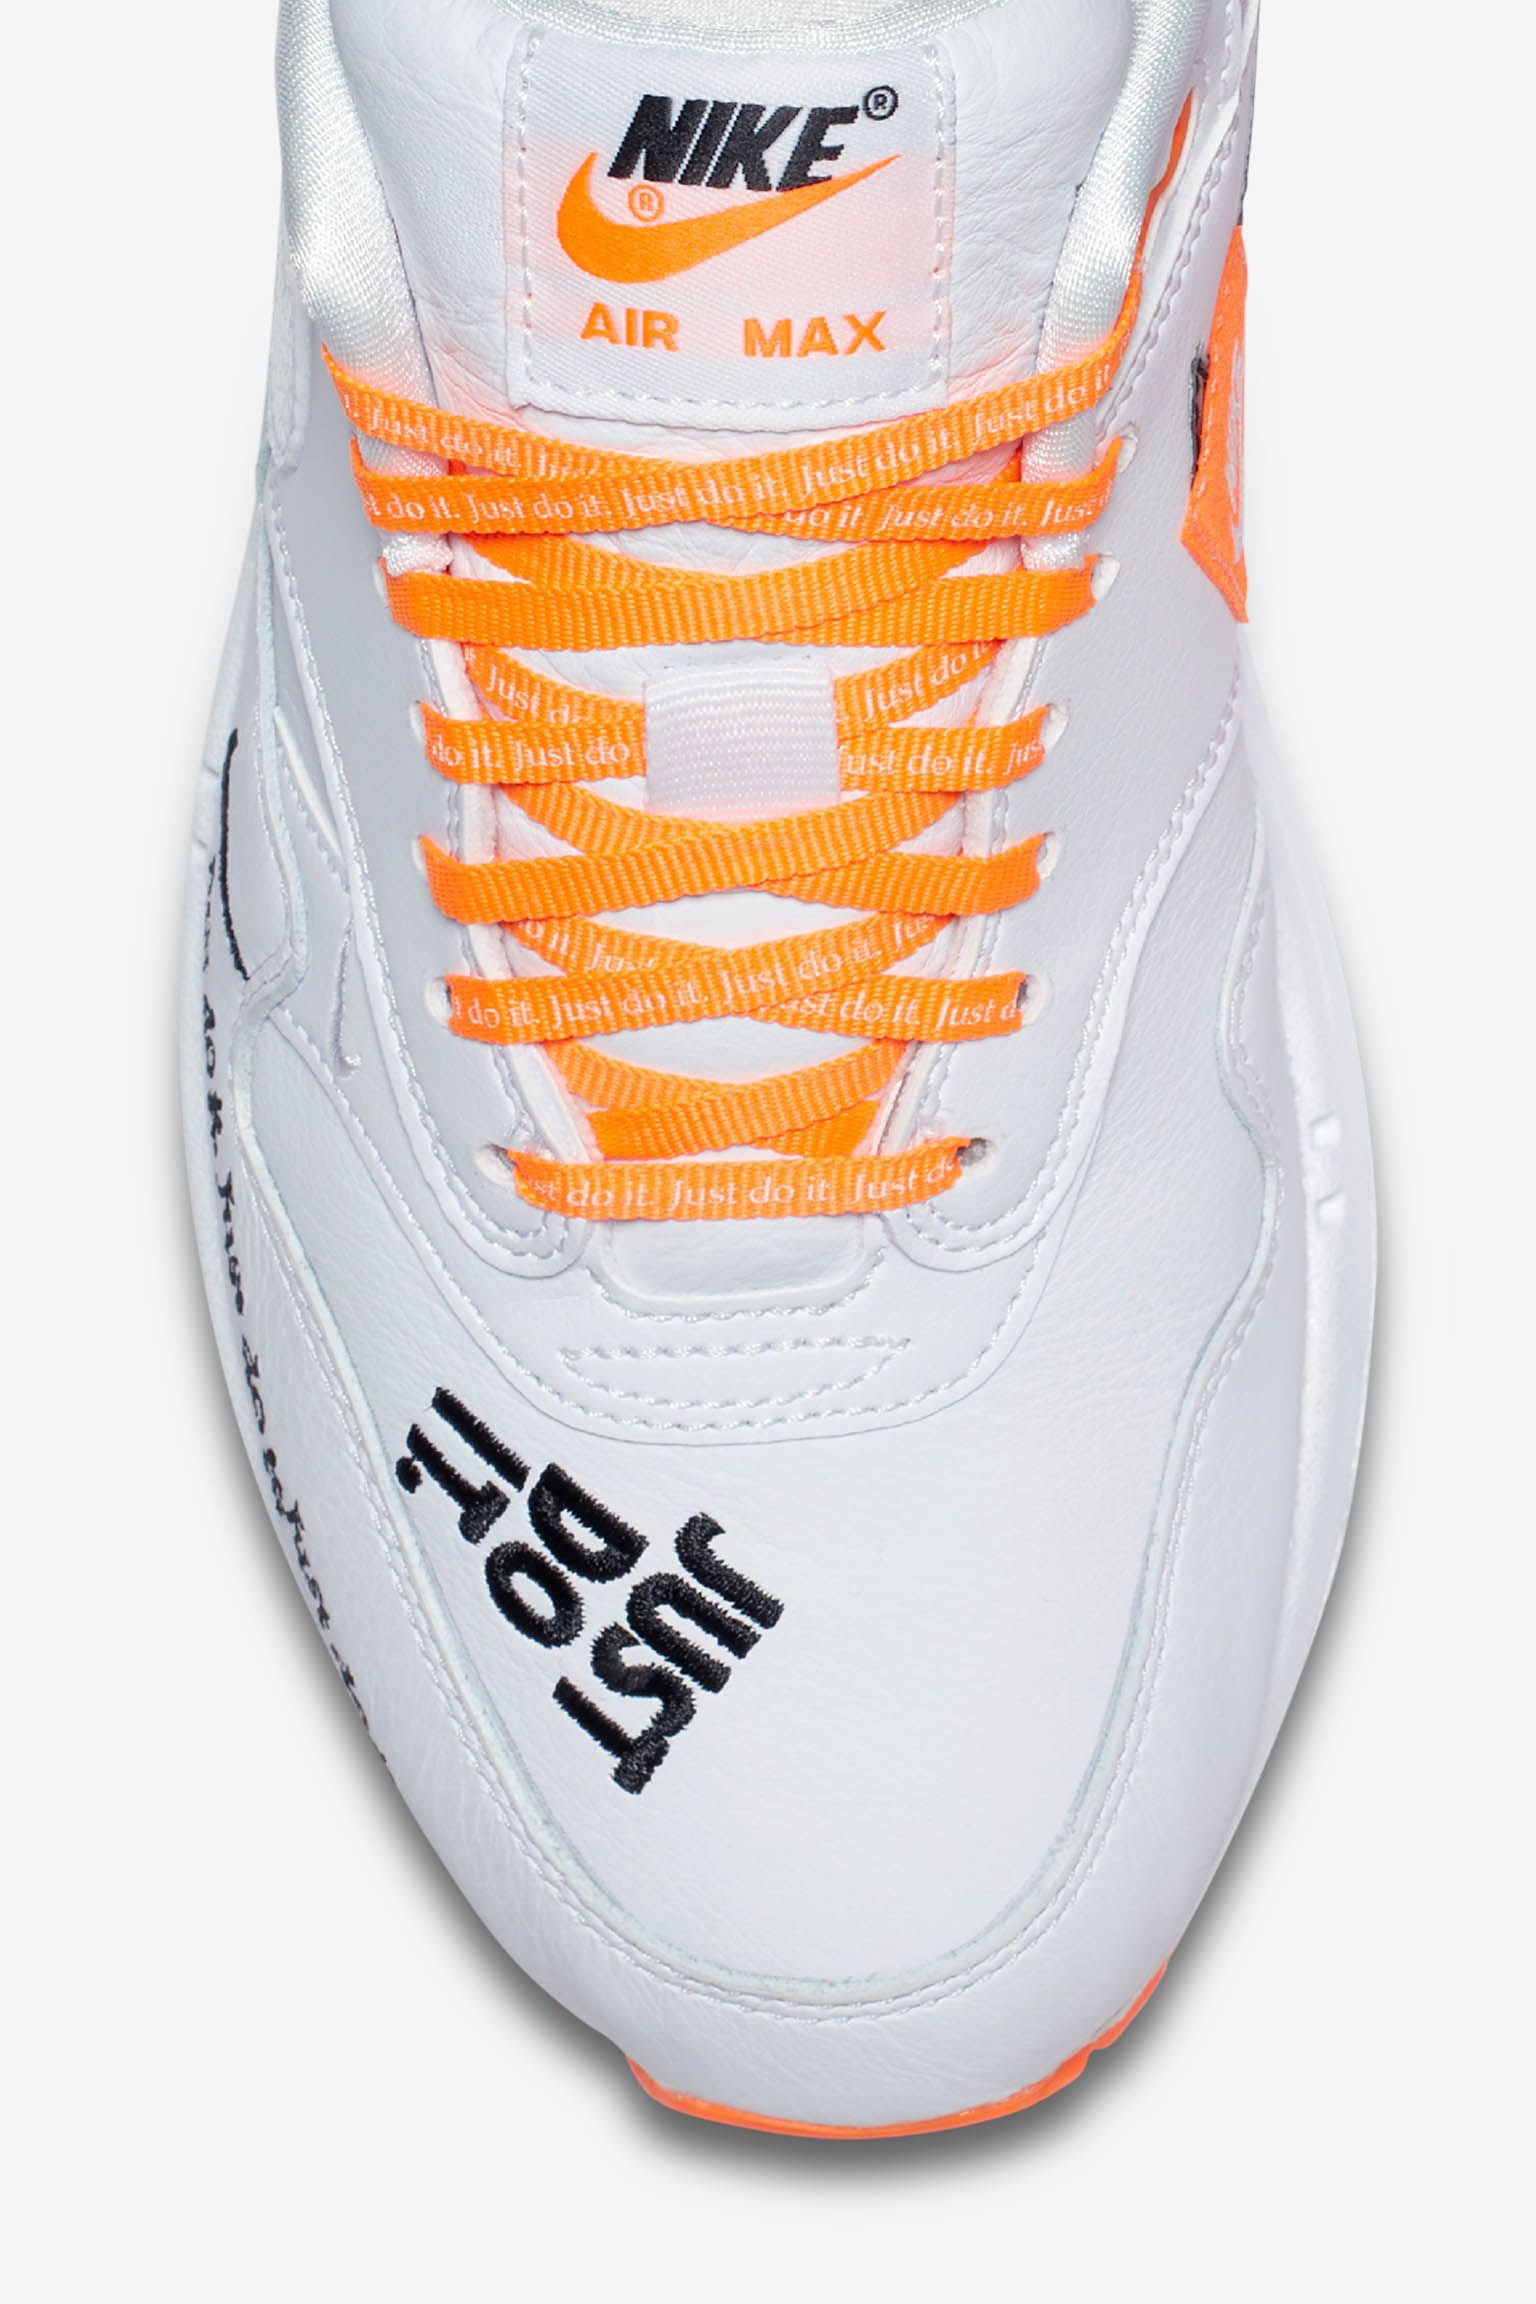 Date de sortie de la Nike Air Max 1 « White & Total Orange ...